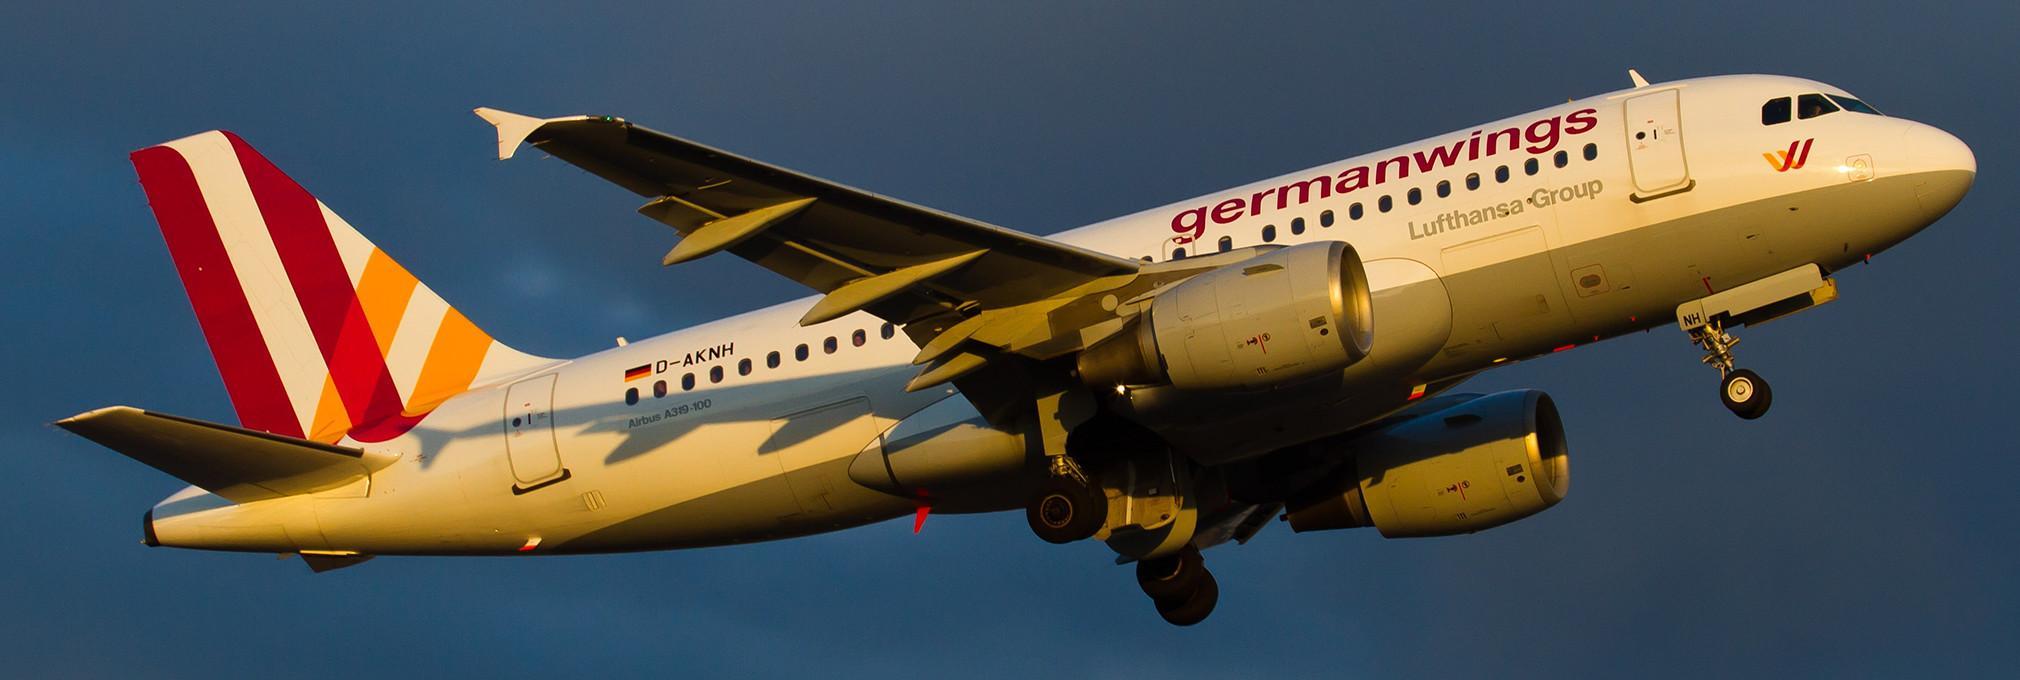 Germanwings Reviews and Flights - TripAdvisor